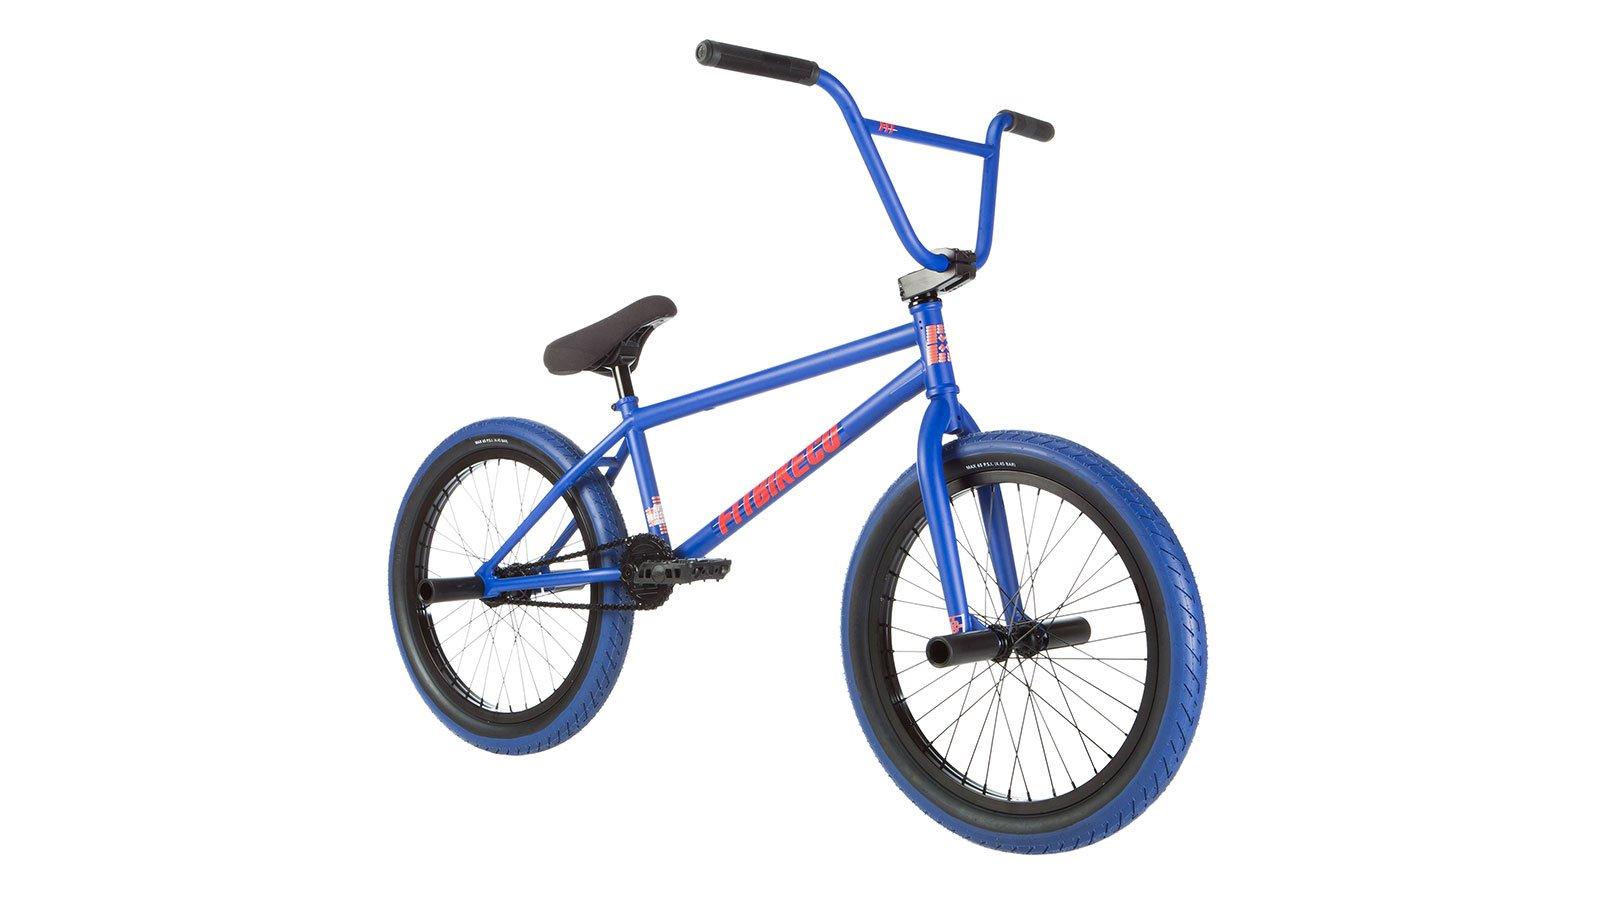 FIT Nordstrom FC 21 BMX bike